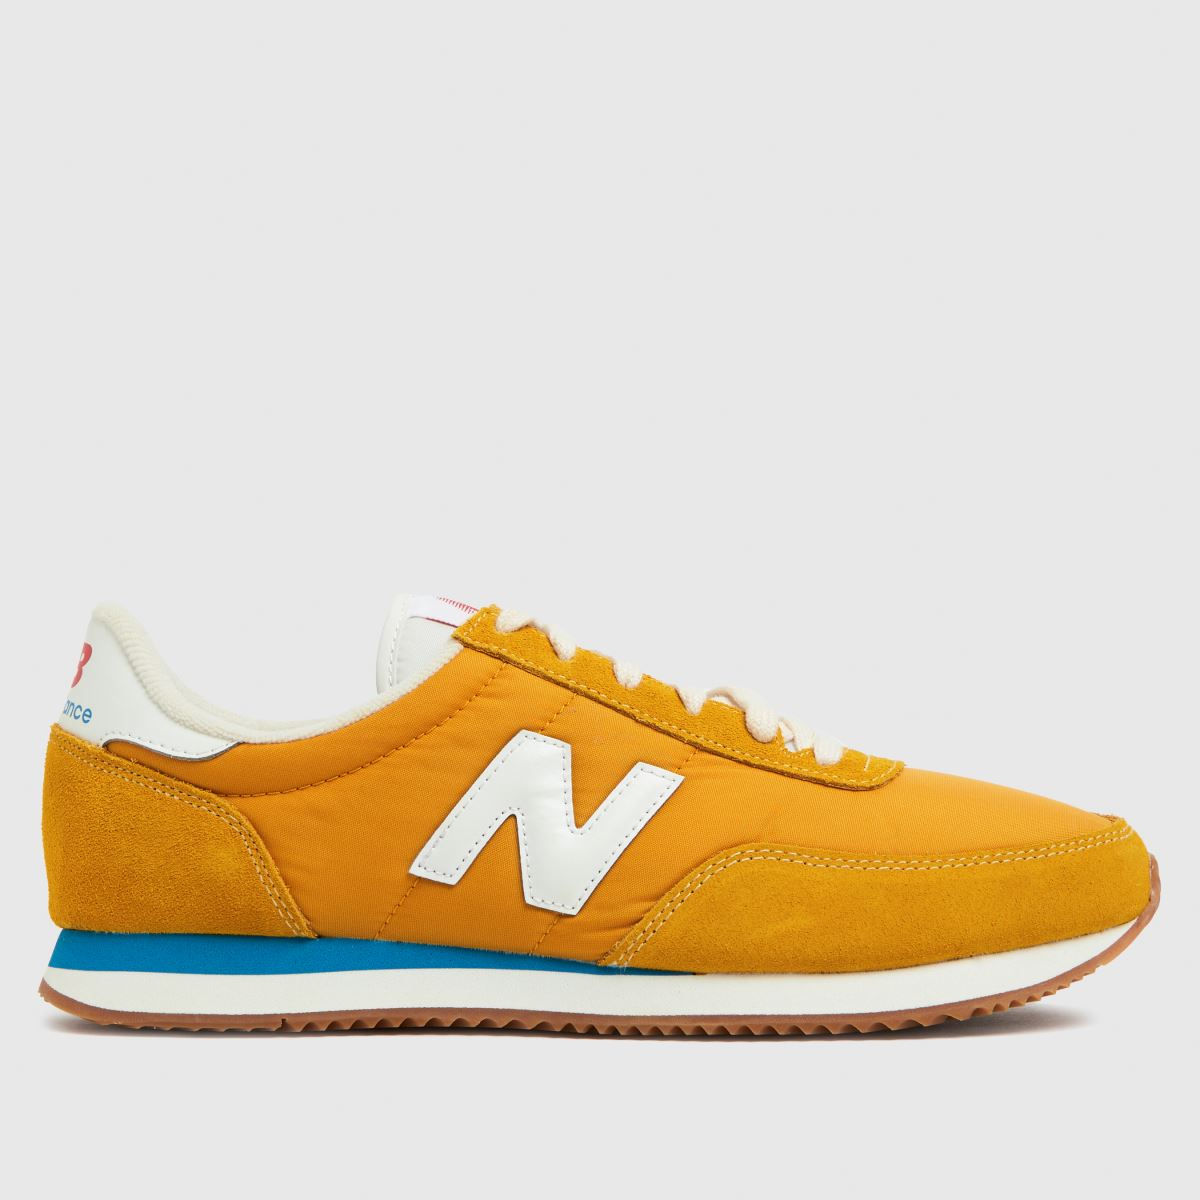 New Balance Yellow 720 Trainers